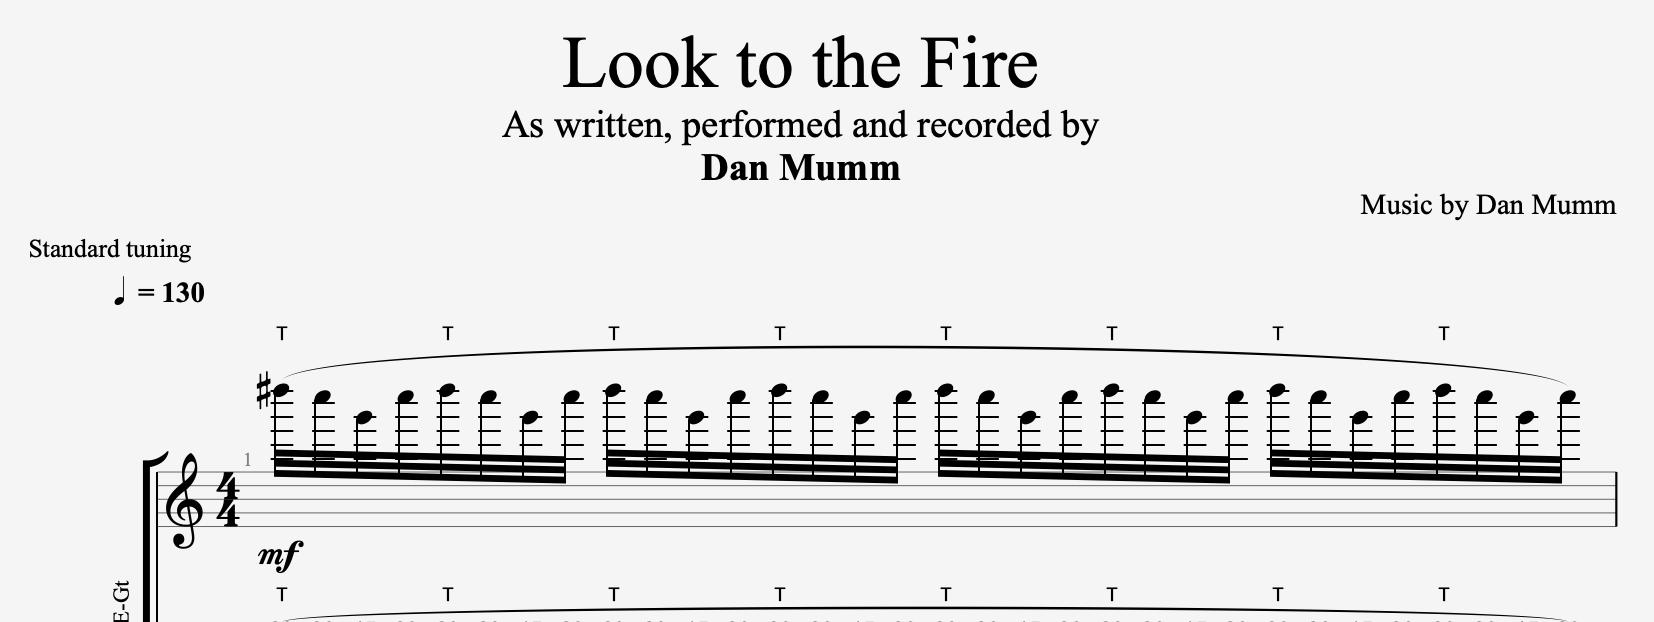 Dan-Mumm-Look-To-The-Fire